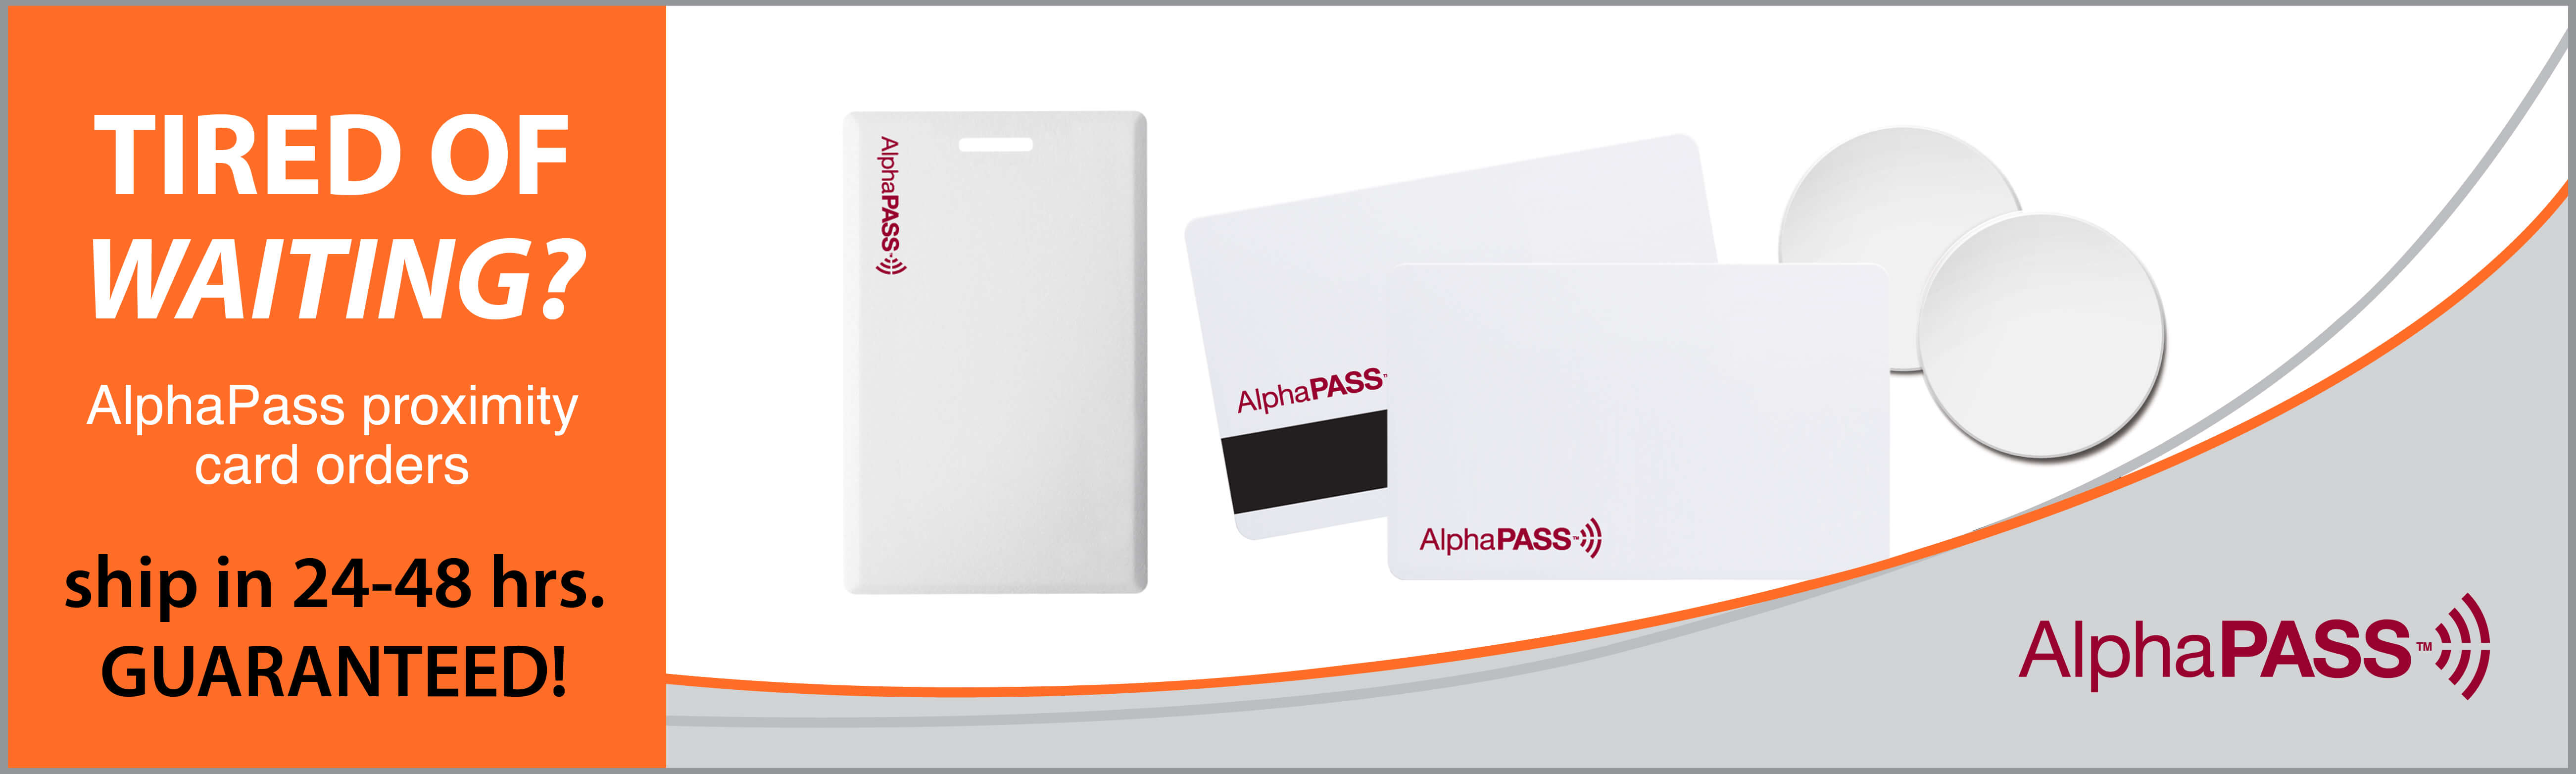 onesource-banner-alphapass.jpg